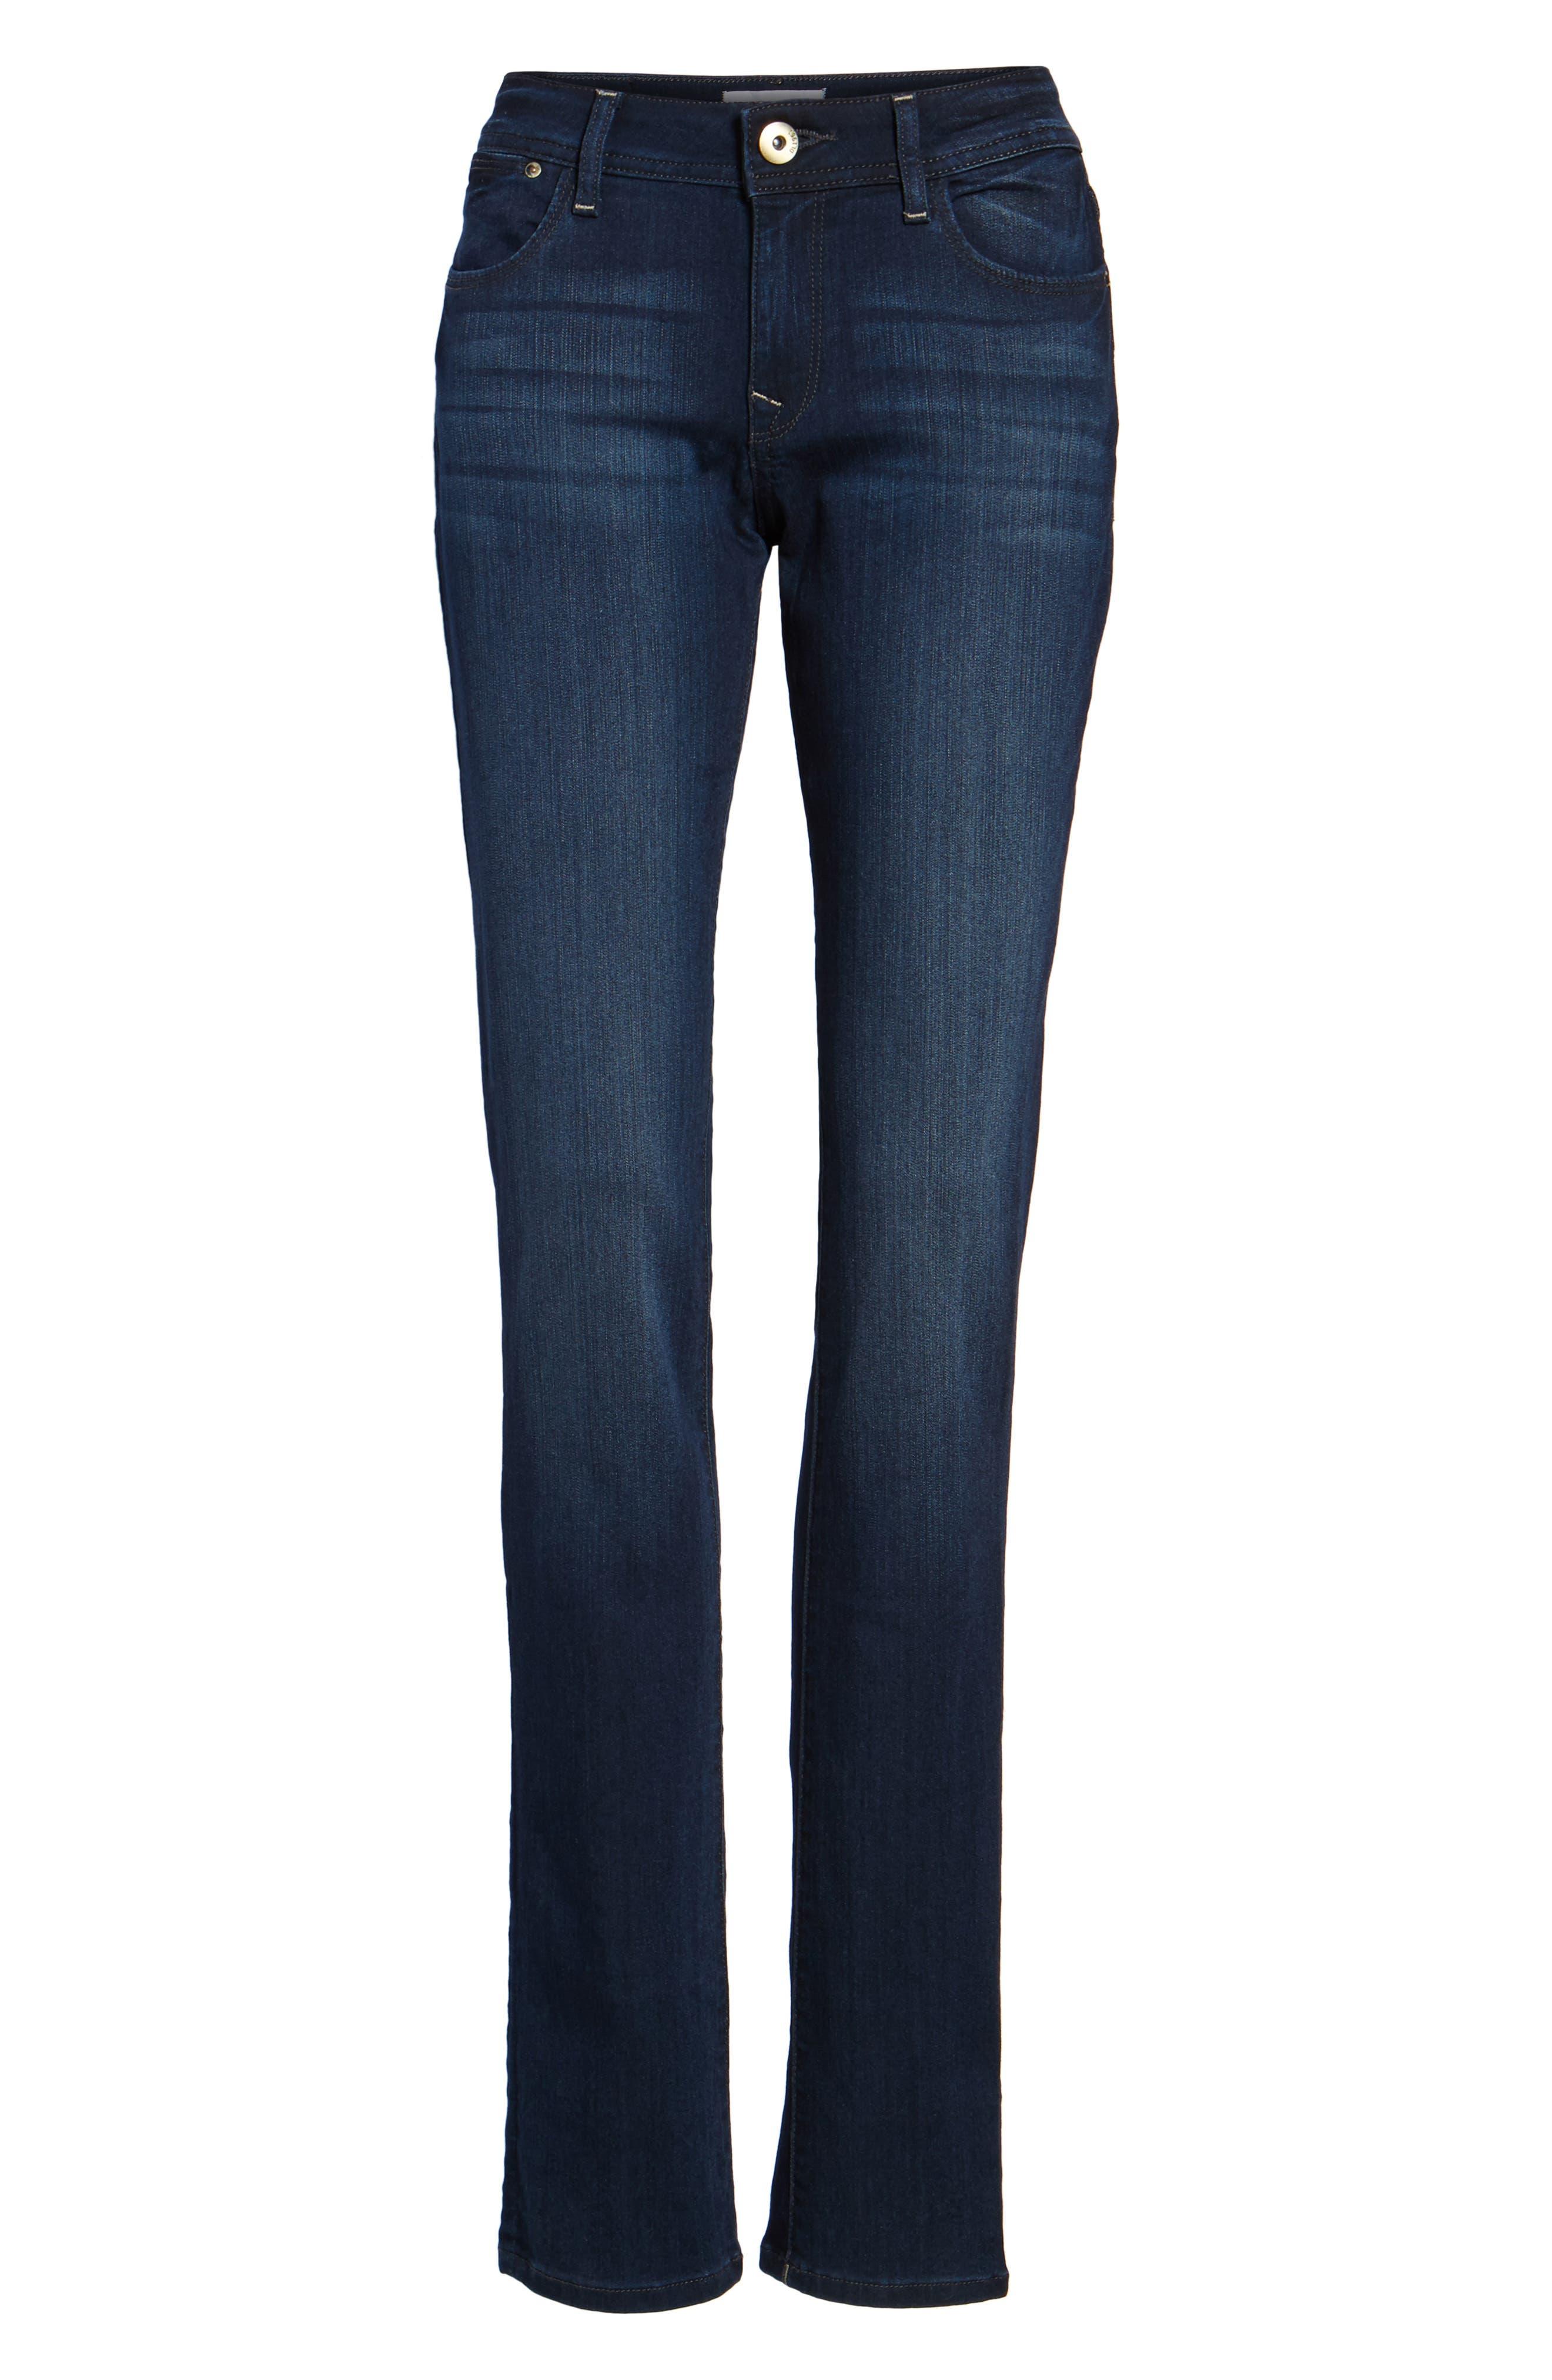 'Grace' Straight Jeans,                             Alternate thumbnail 7, color,                             405